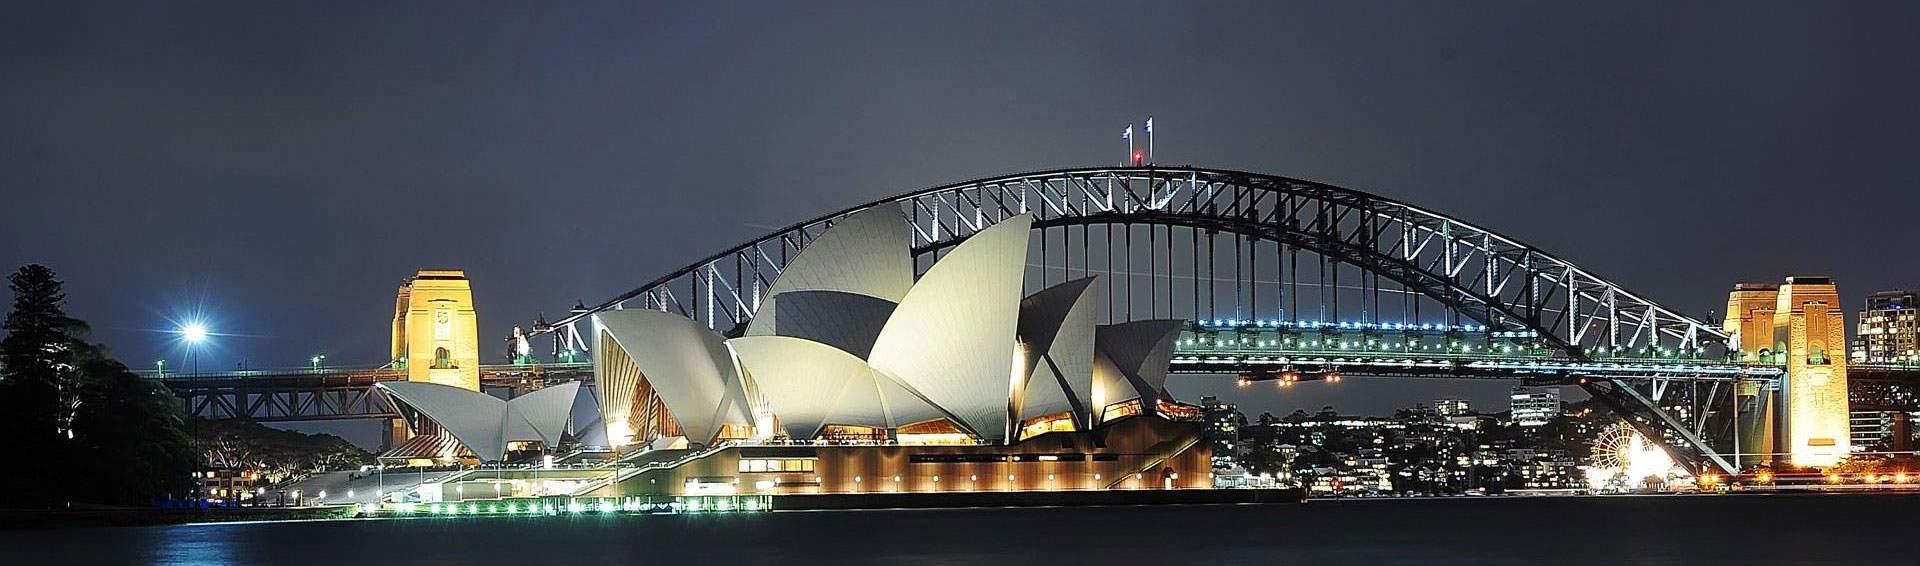 sydney-opera-house-opt